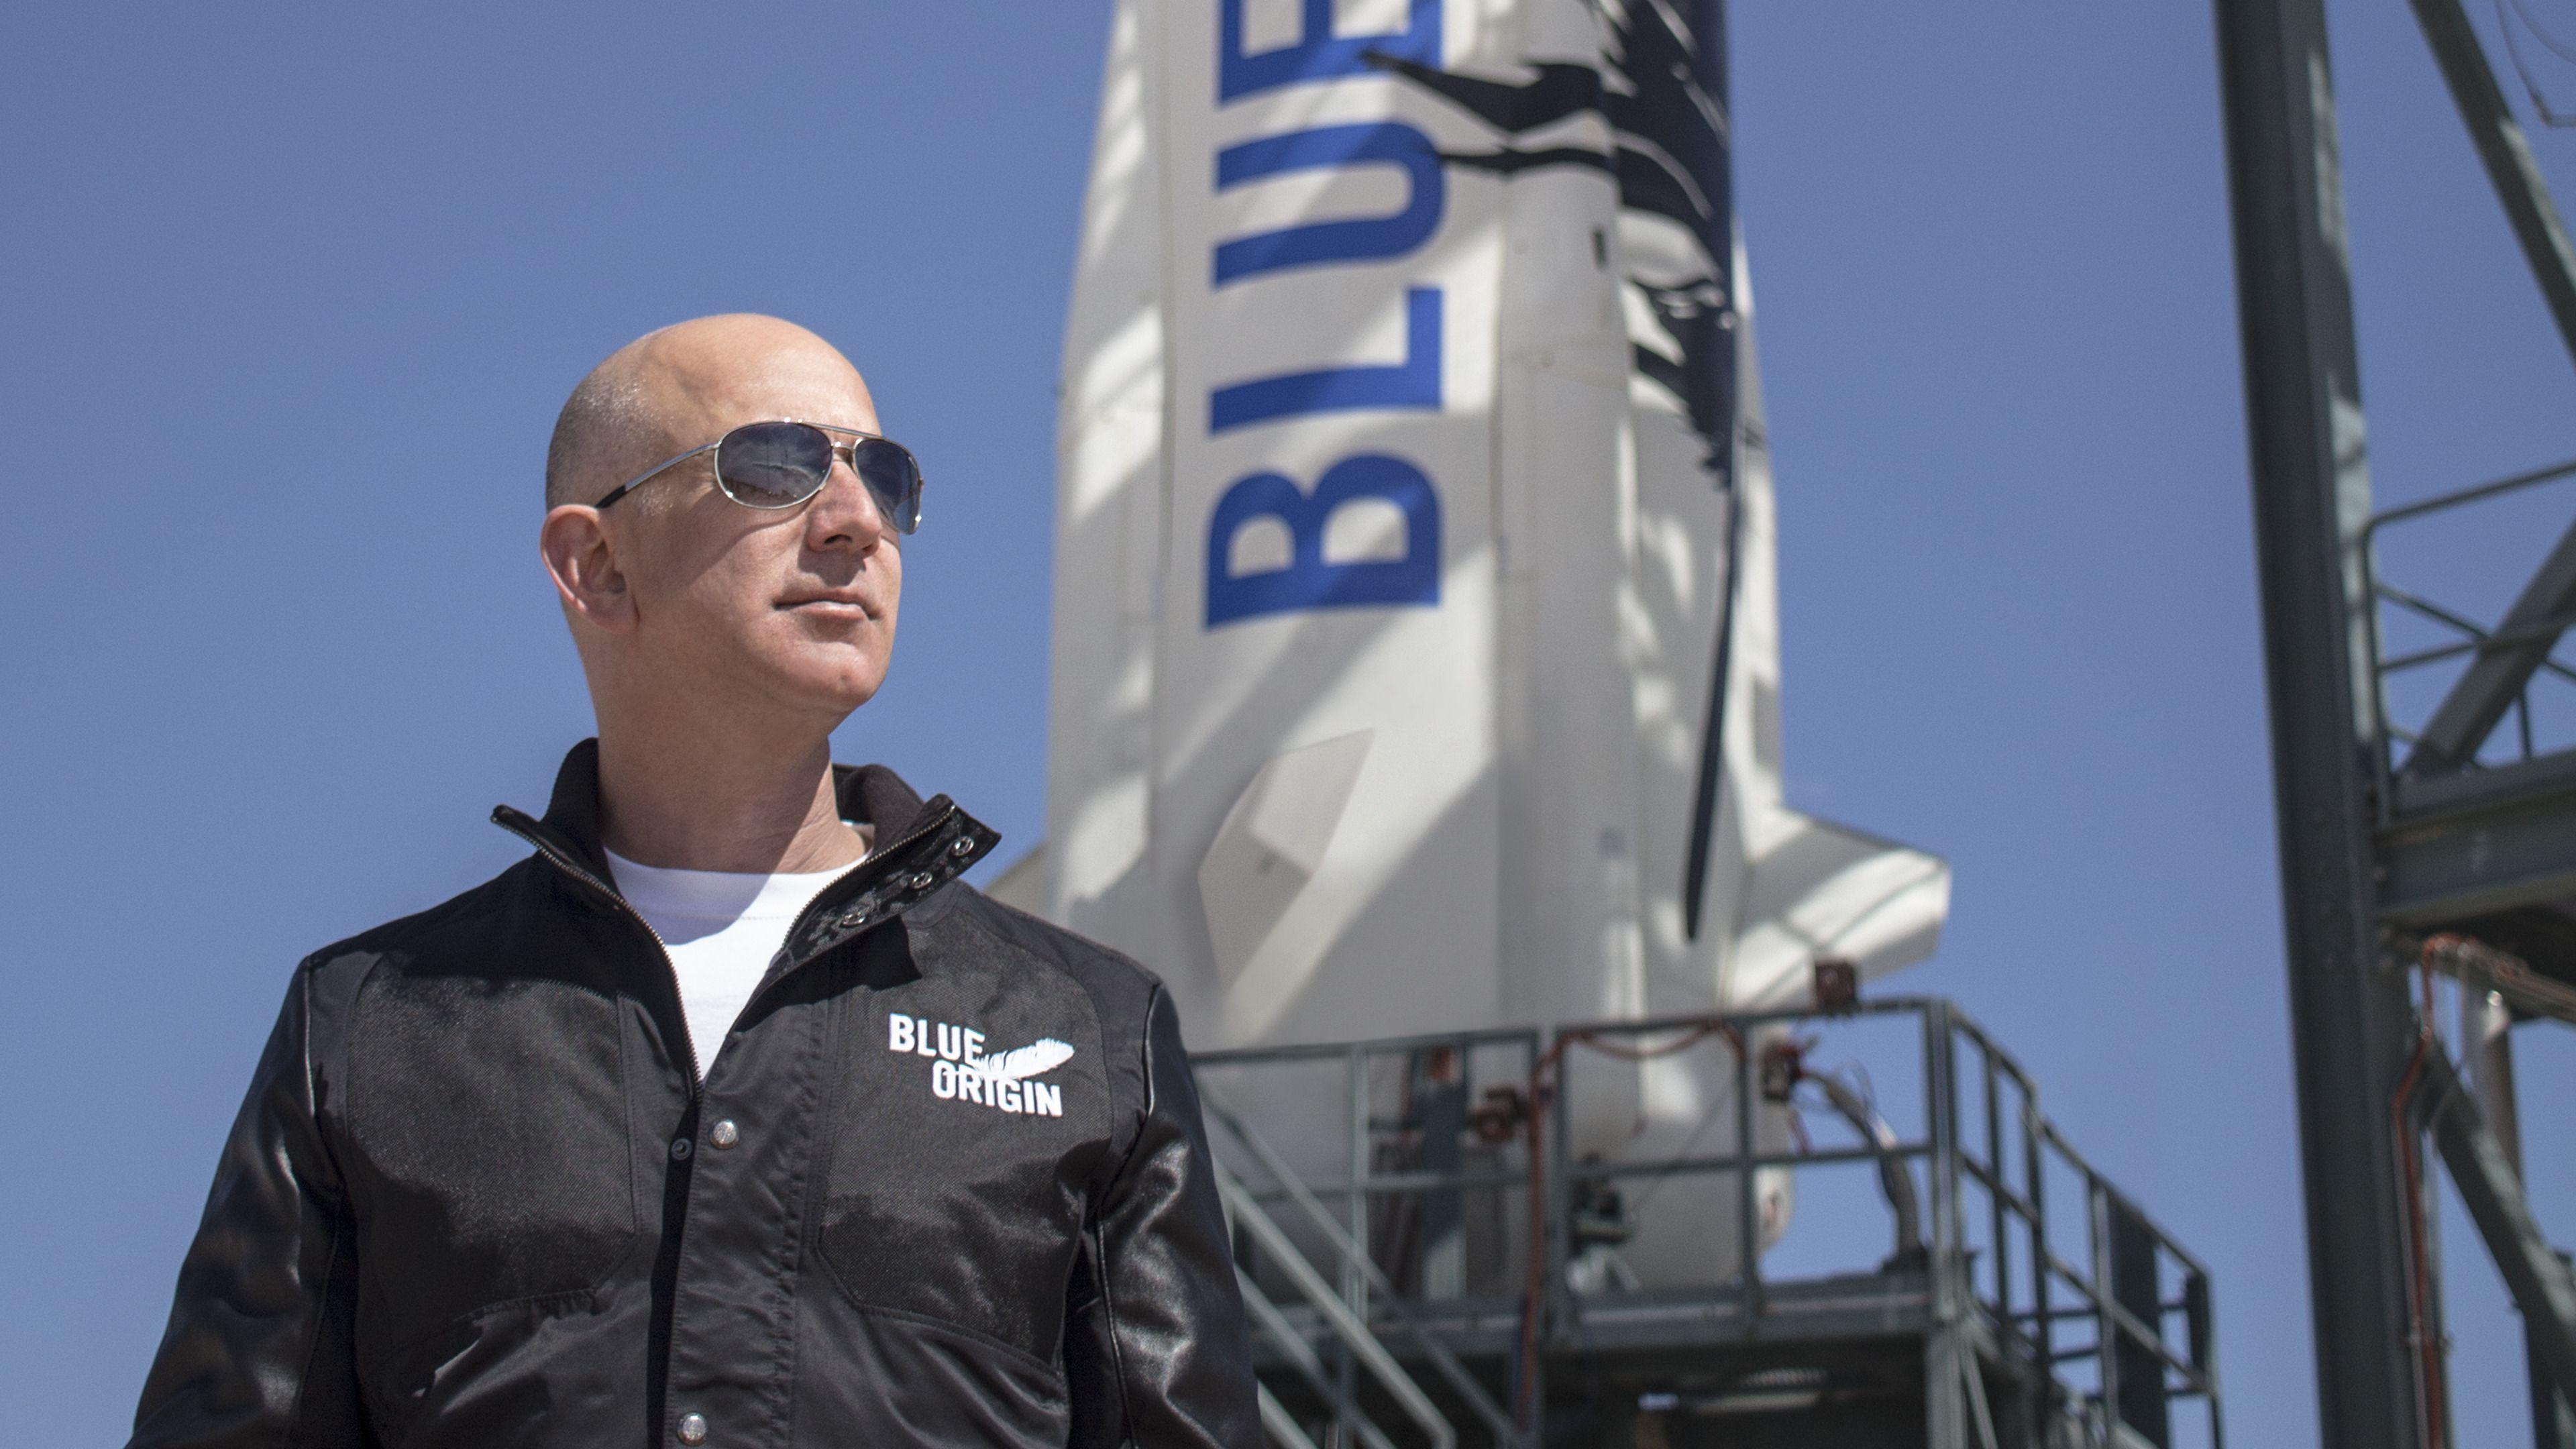 Jeff Bezos tilbyr Nasa to milliard dollar i rabatt for månelandingsfartøy